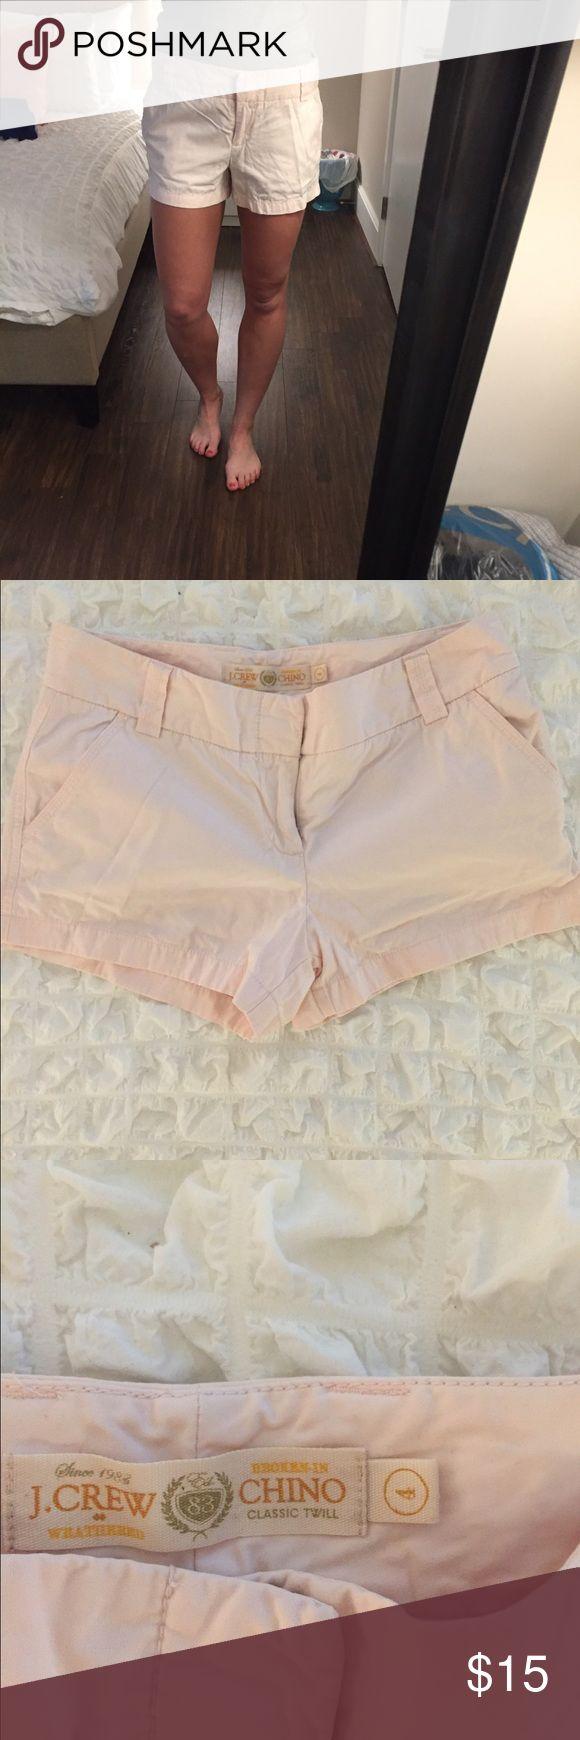 J Crew light pink chino shorts • size 4 Light pink shorts J. Crew Shorts